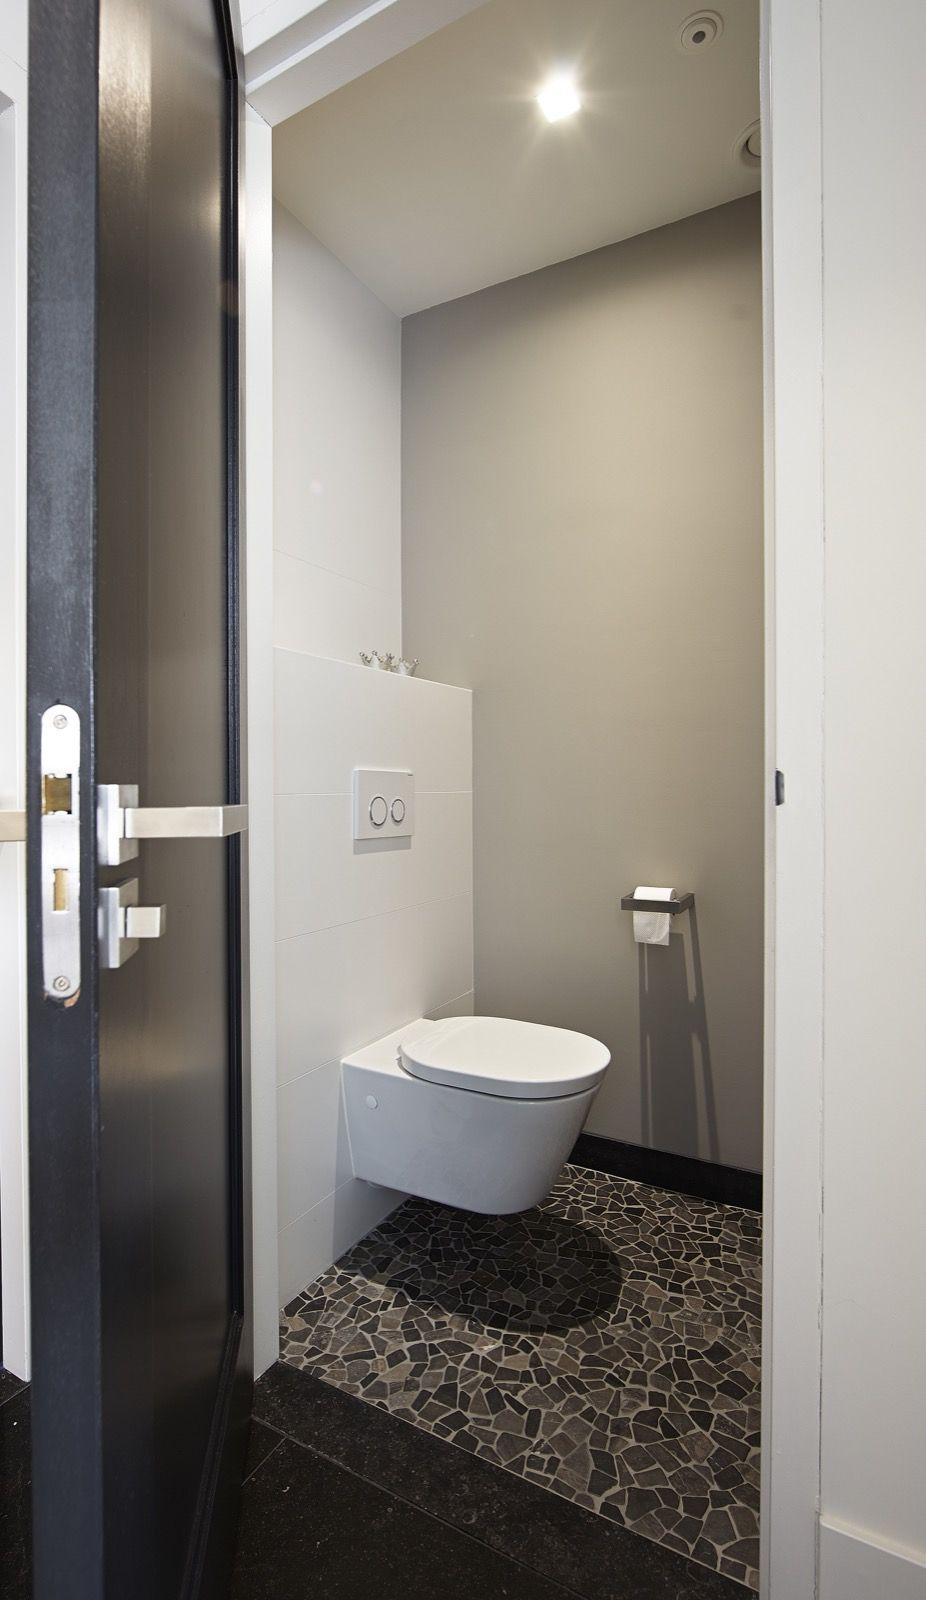 Luxe toilet met glasmozaiek | badkamer ideeën | design badkamers ...